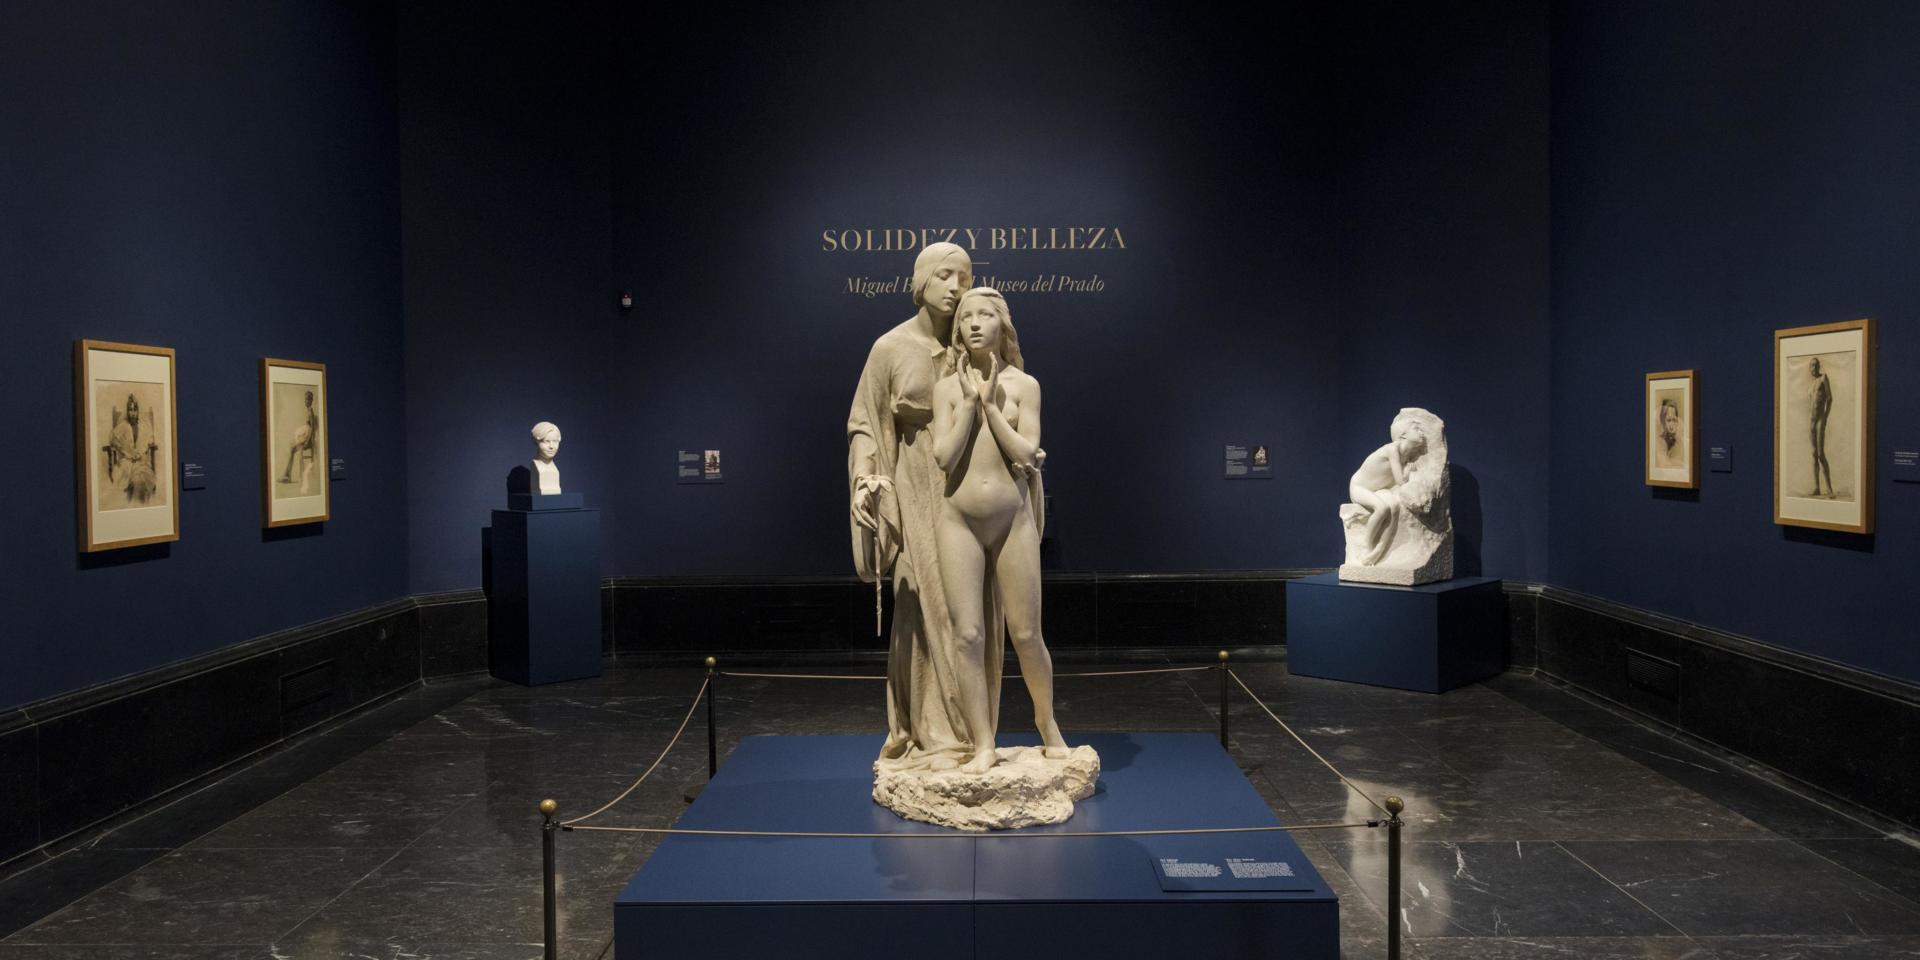 "Prat de la mostra ""Solidez y Belleza"" on s'exposava l'obra de Miquel Blay dins dels fons del Museo del Prado. Museo Nacional del Prado."